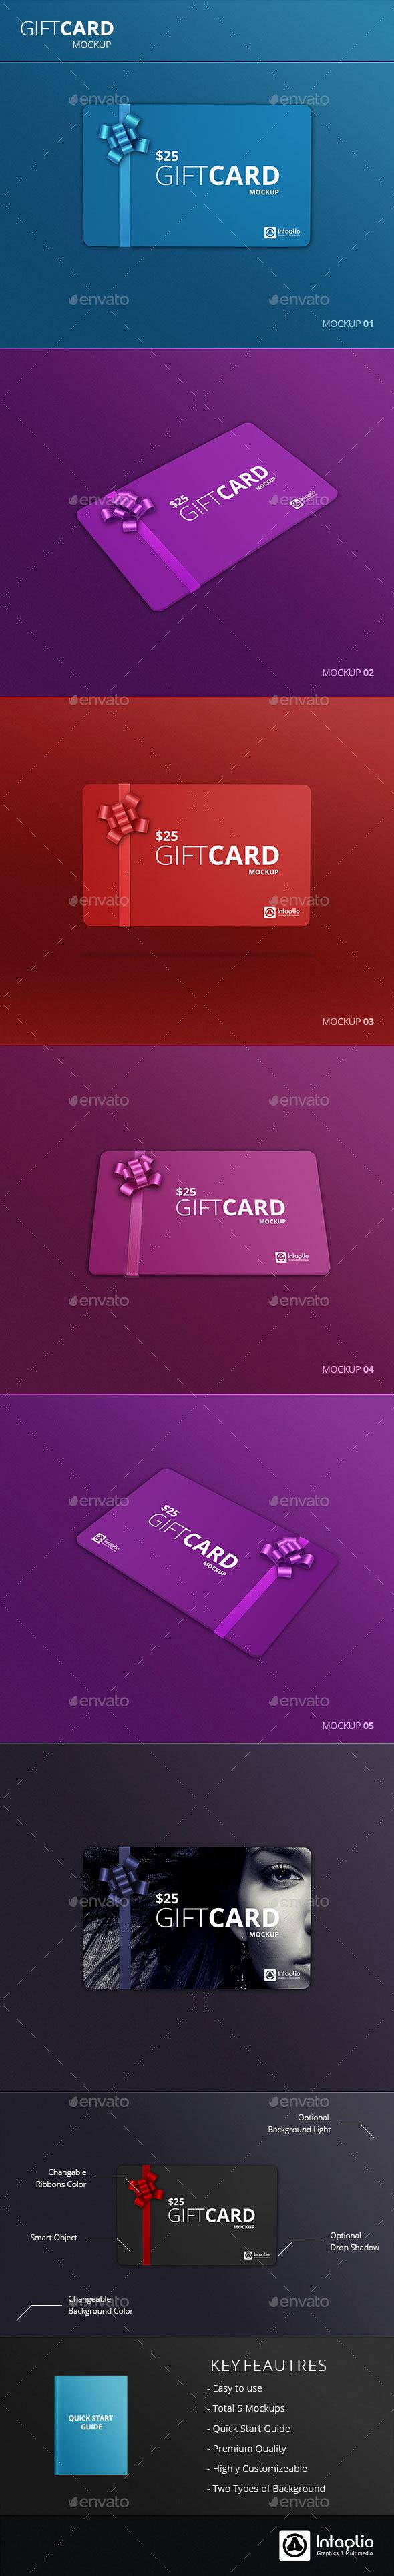 Gift Card Mockup v2